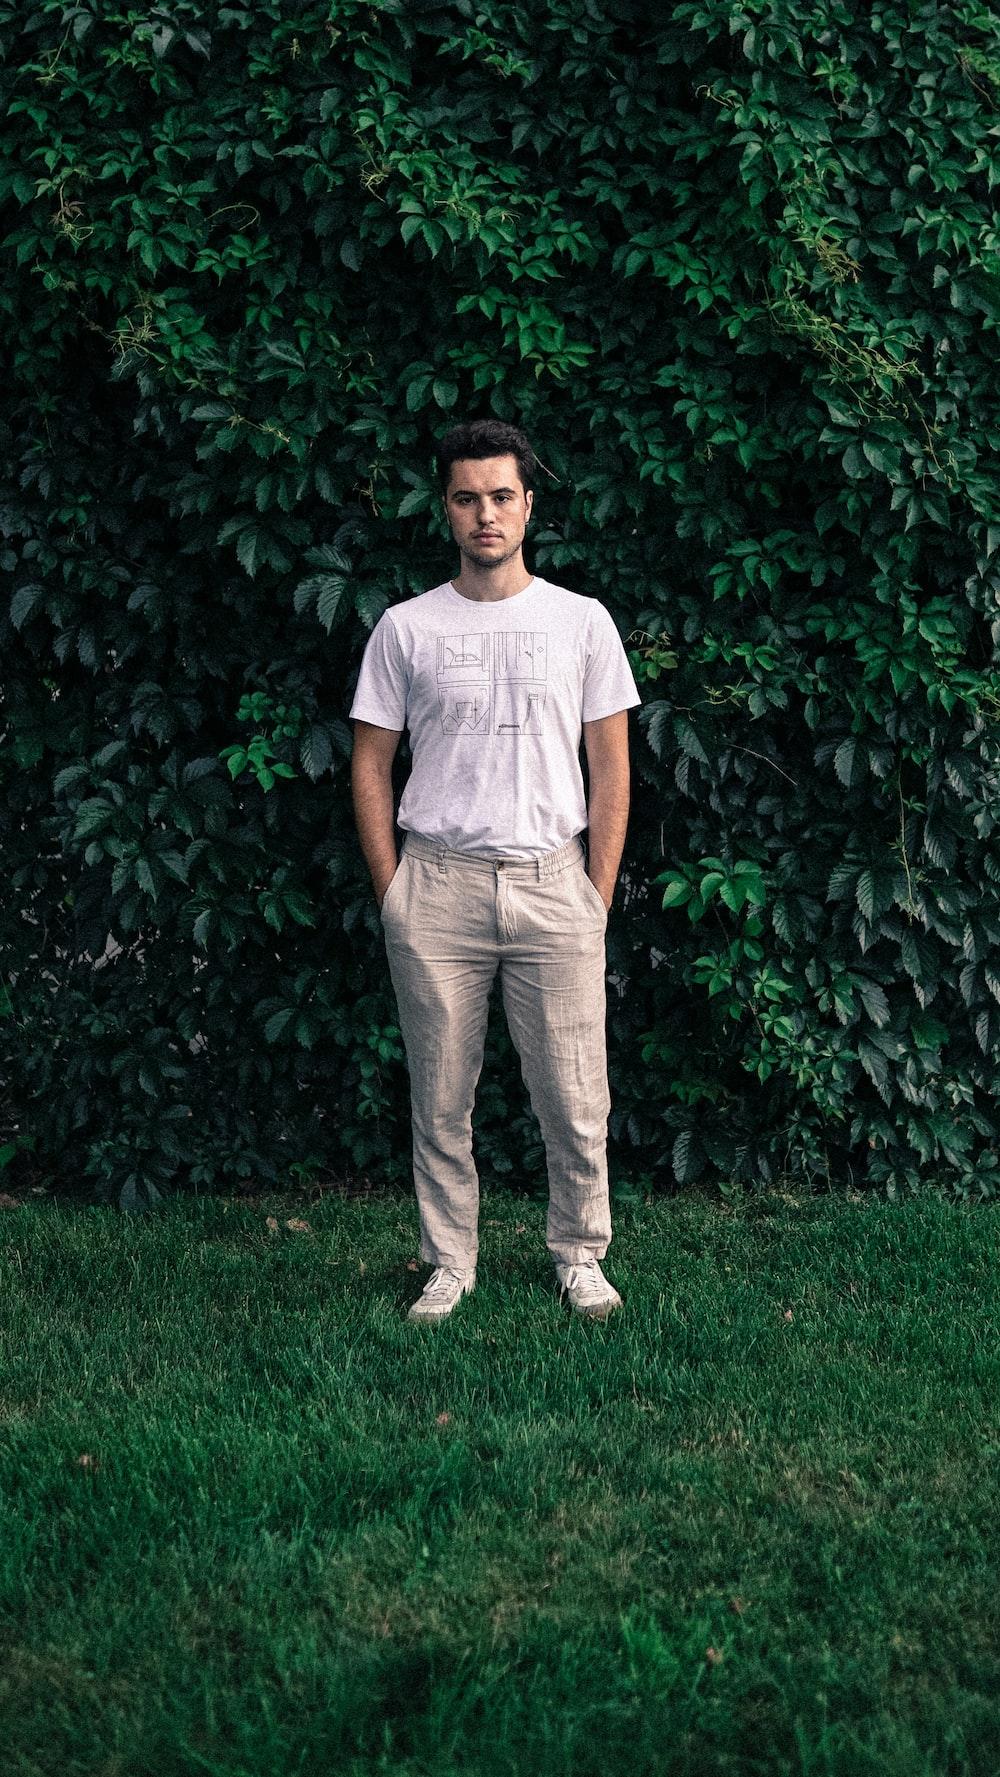 man wearing white shirt standing on grass lawn